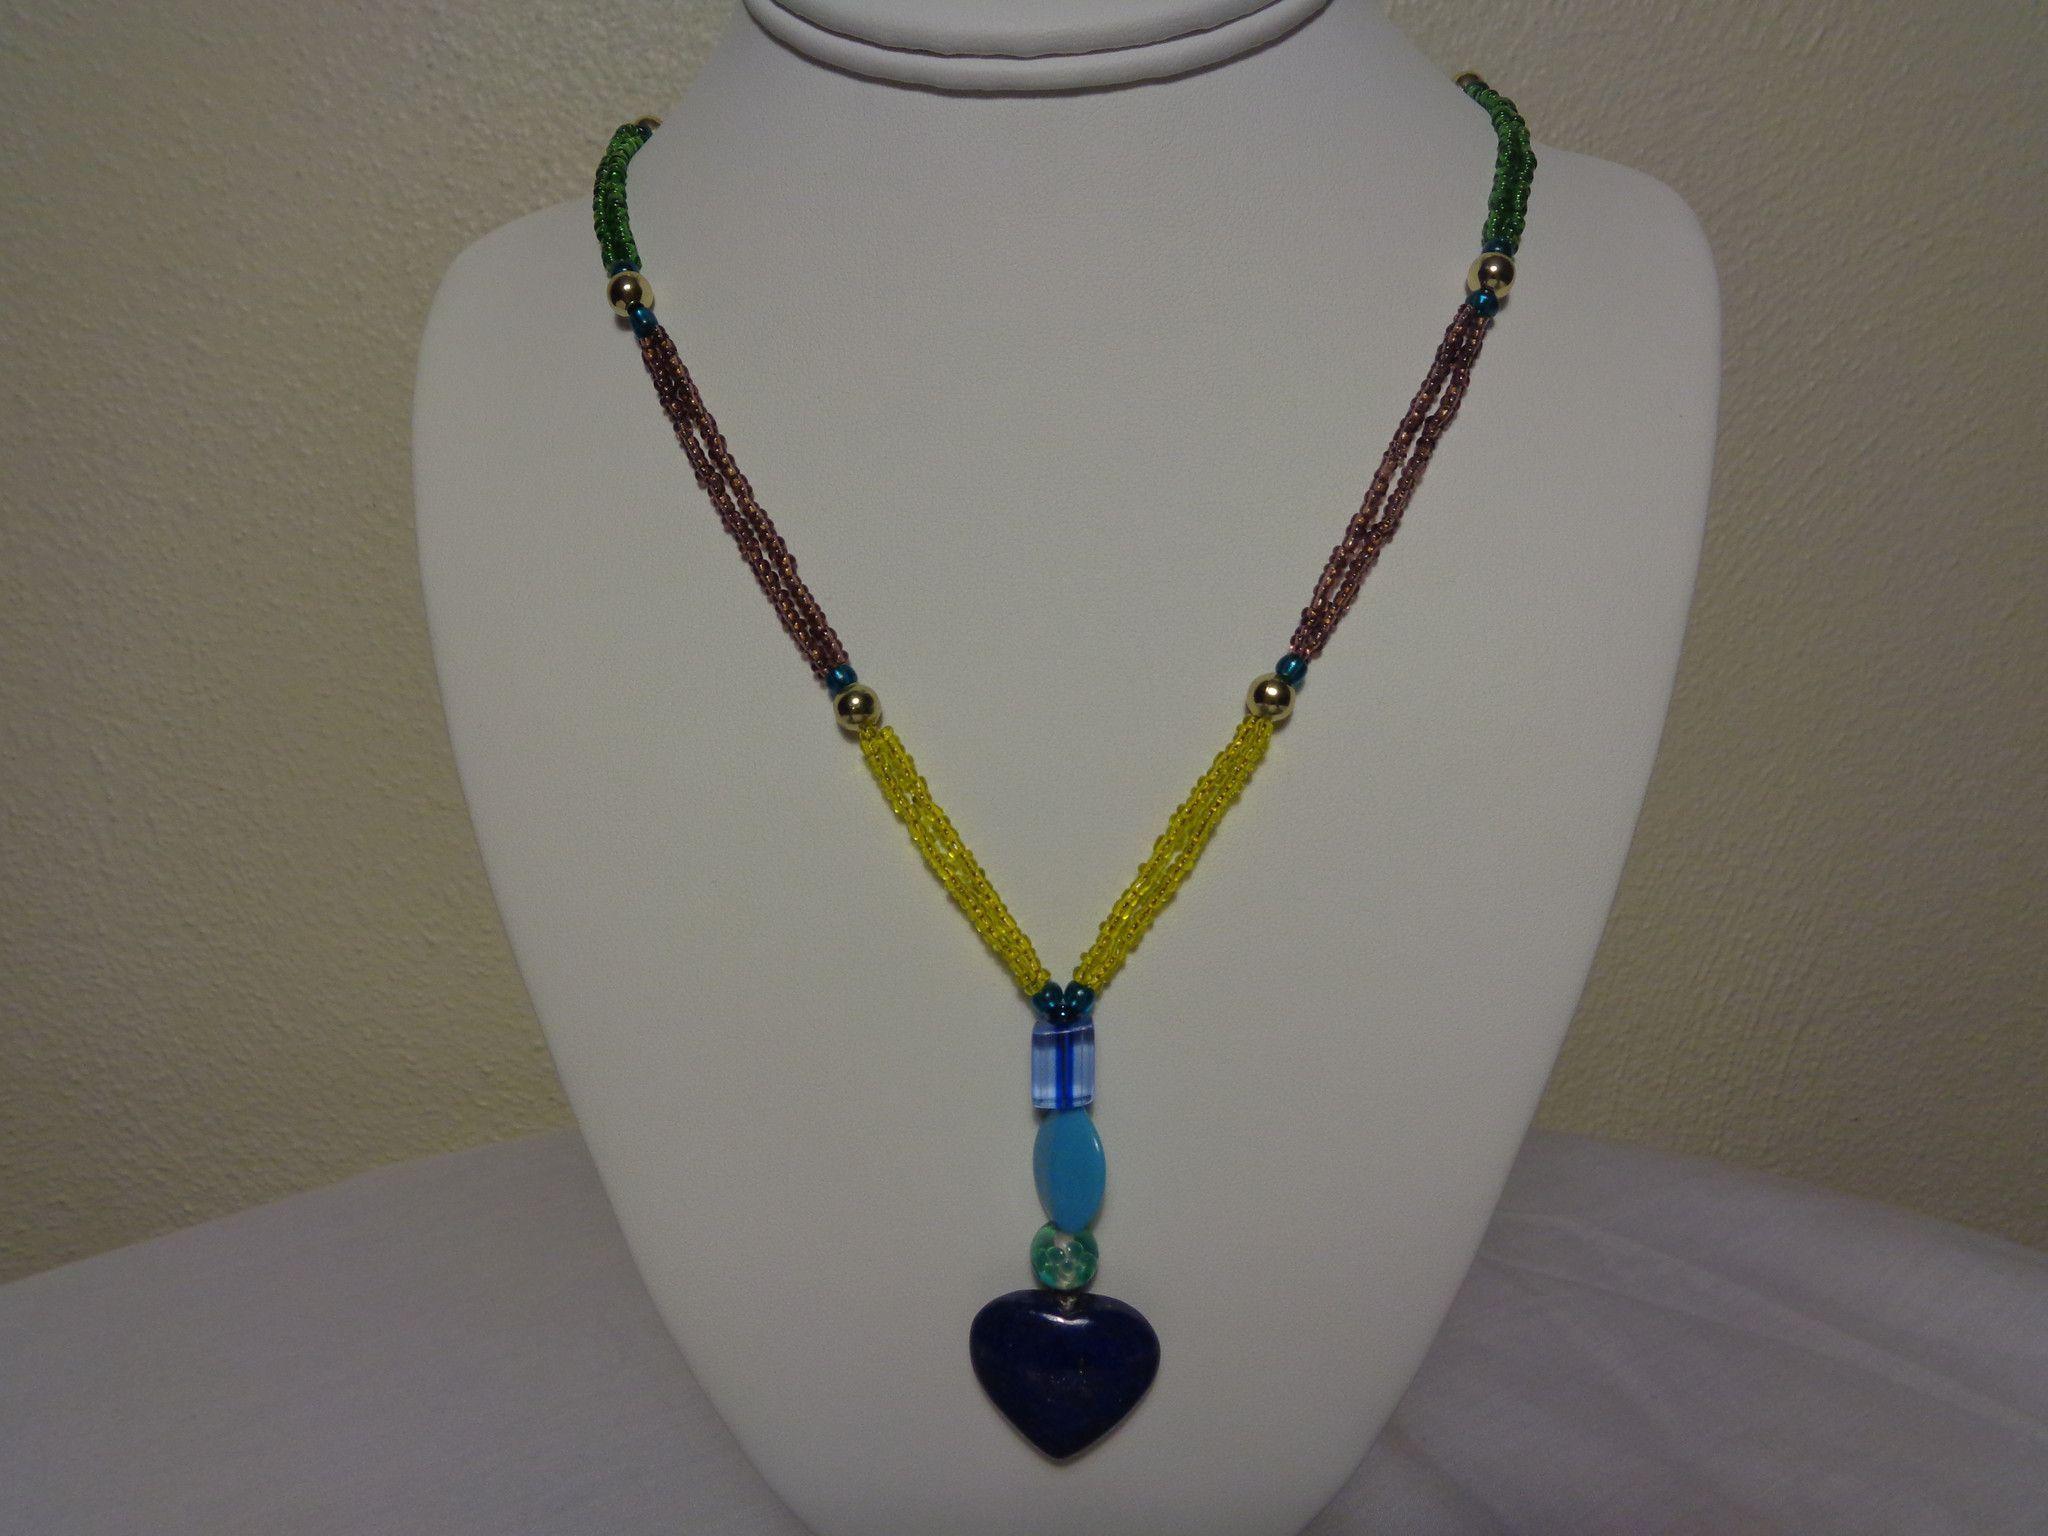 Beads Multi-color Lapis Lazuli Heart Shaped Pendant Necklace